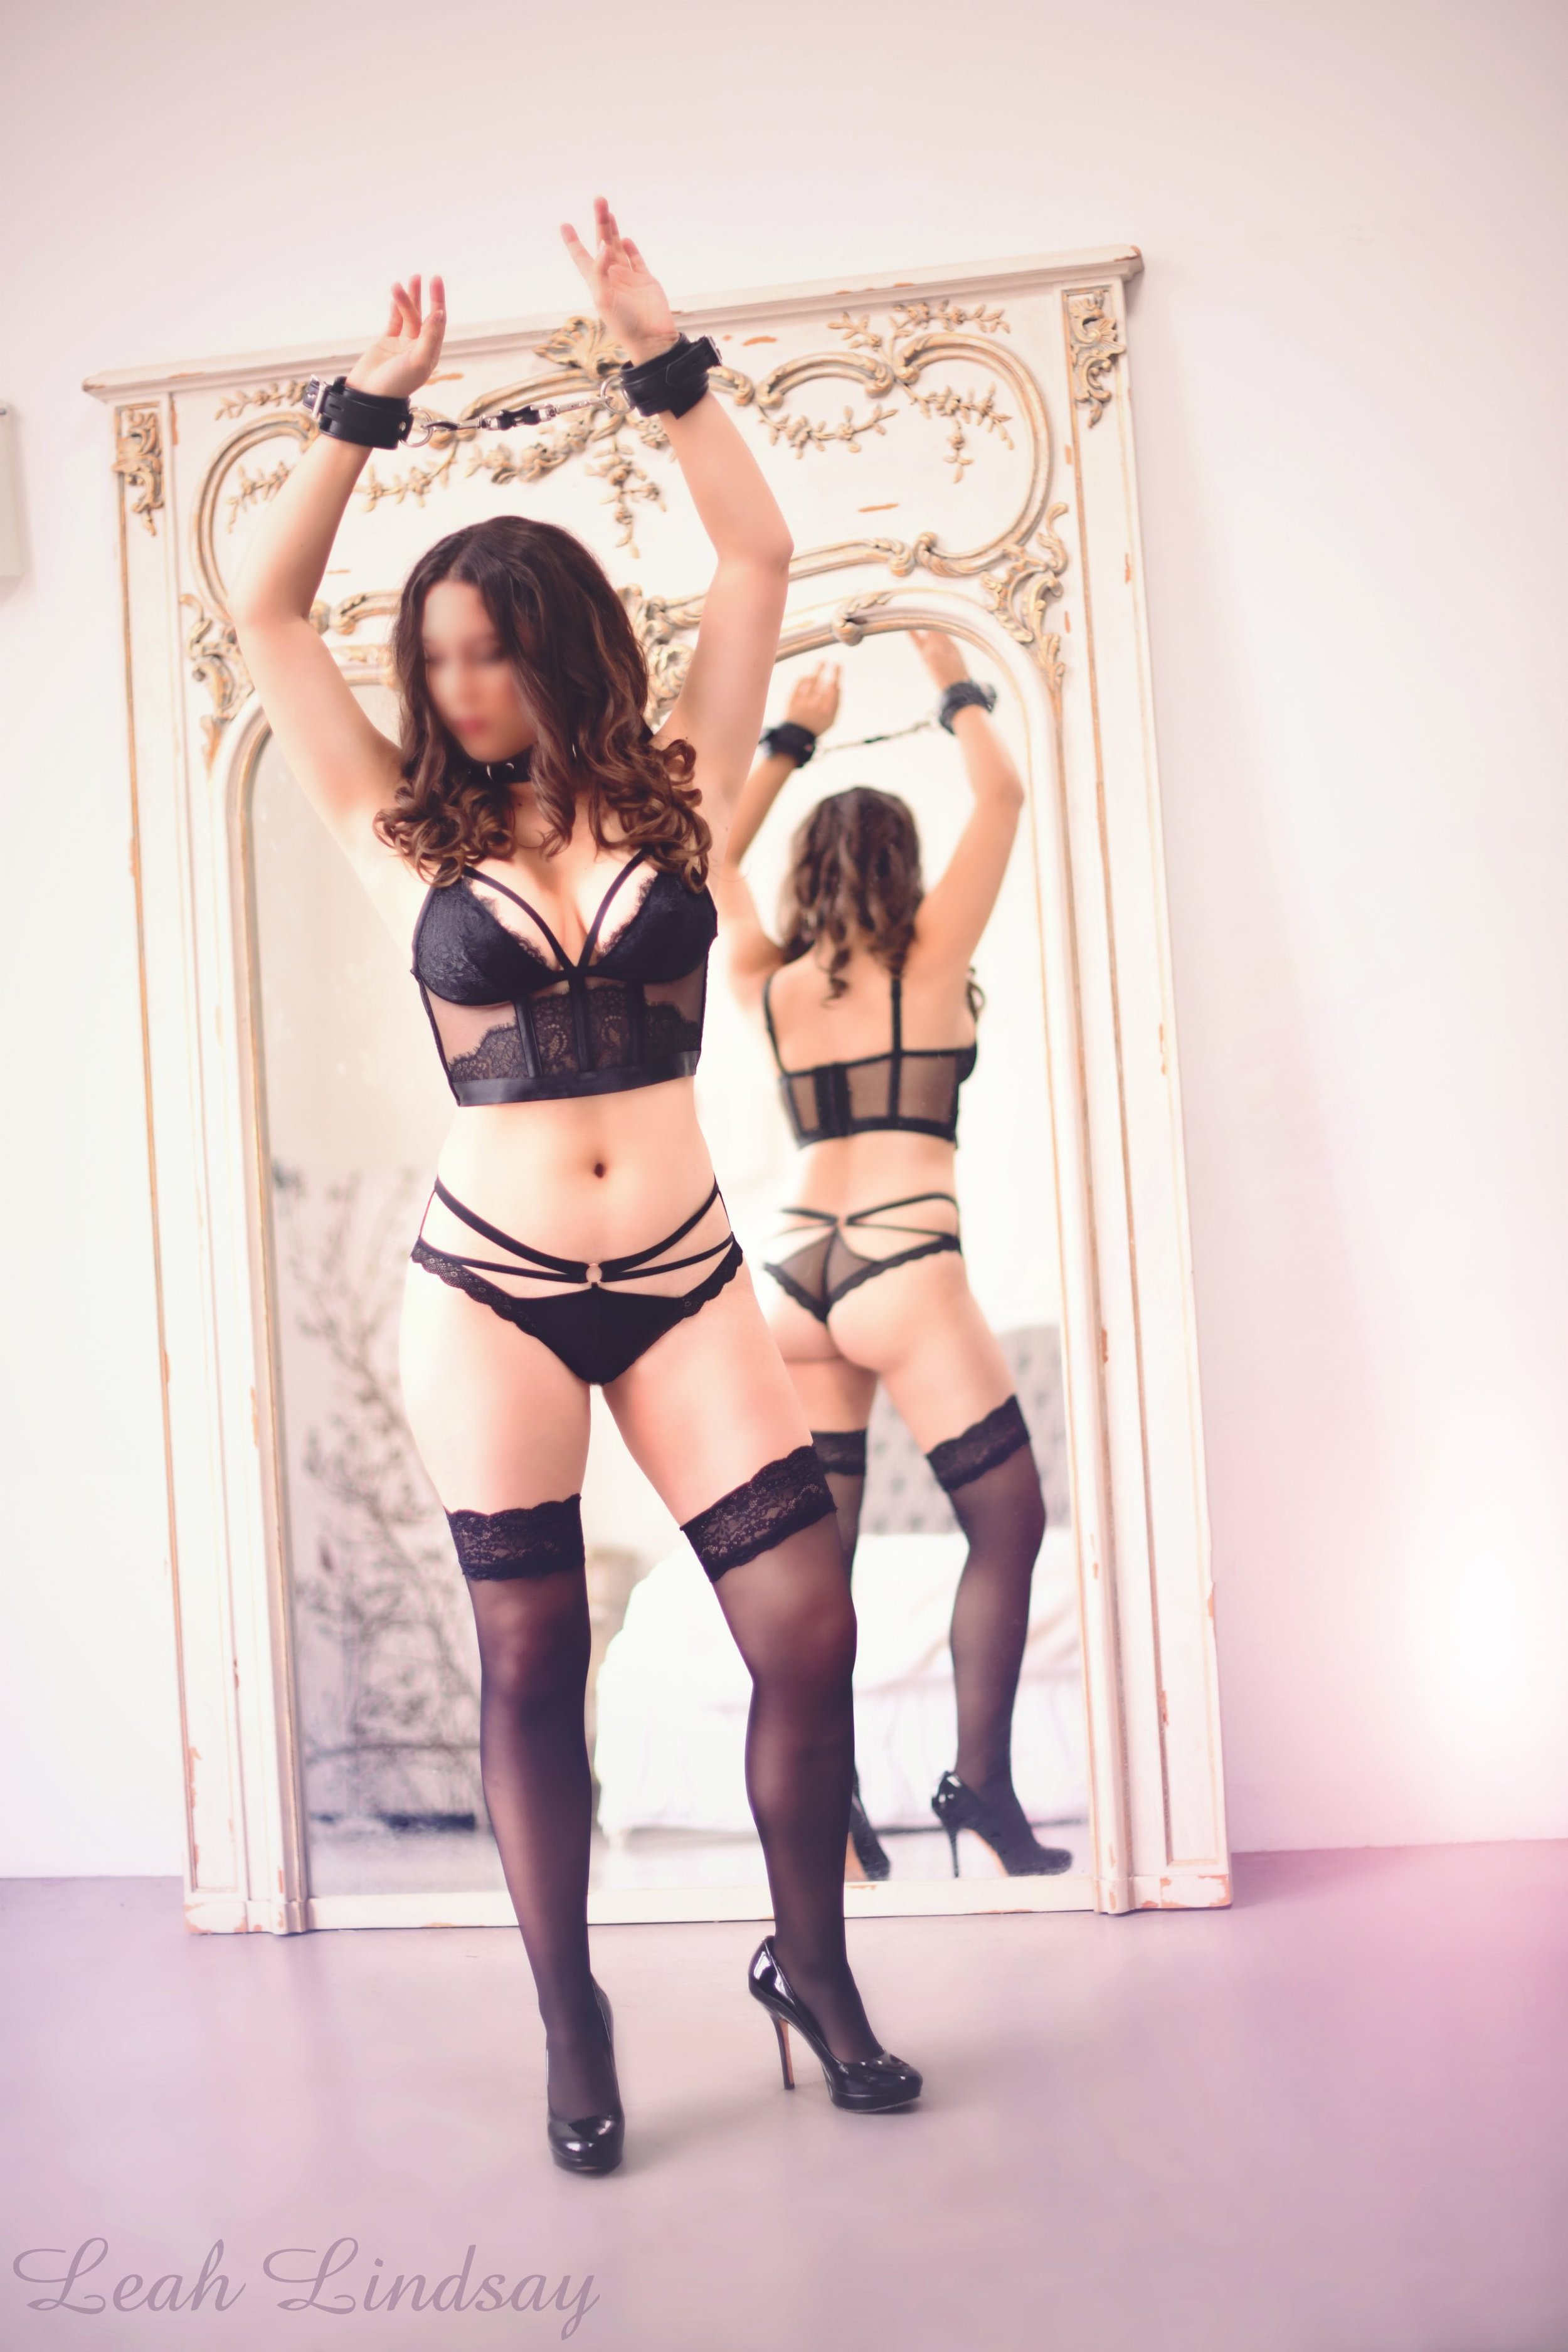 Leah Lindsay - Kinky BDSM Submissive